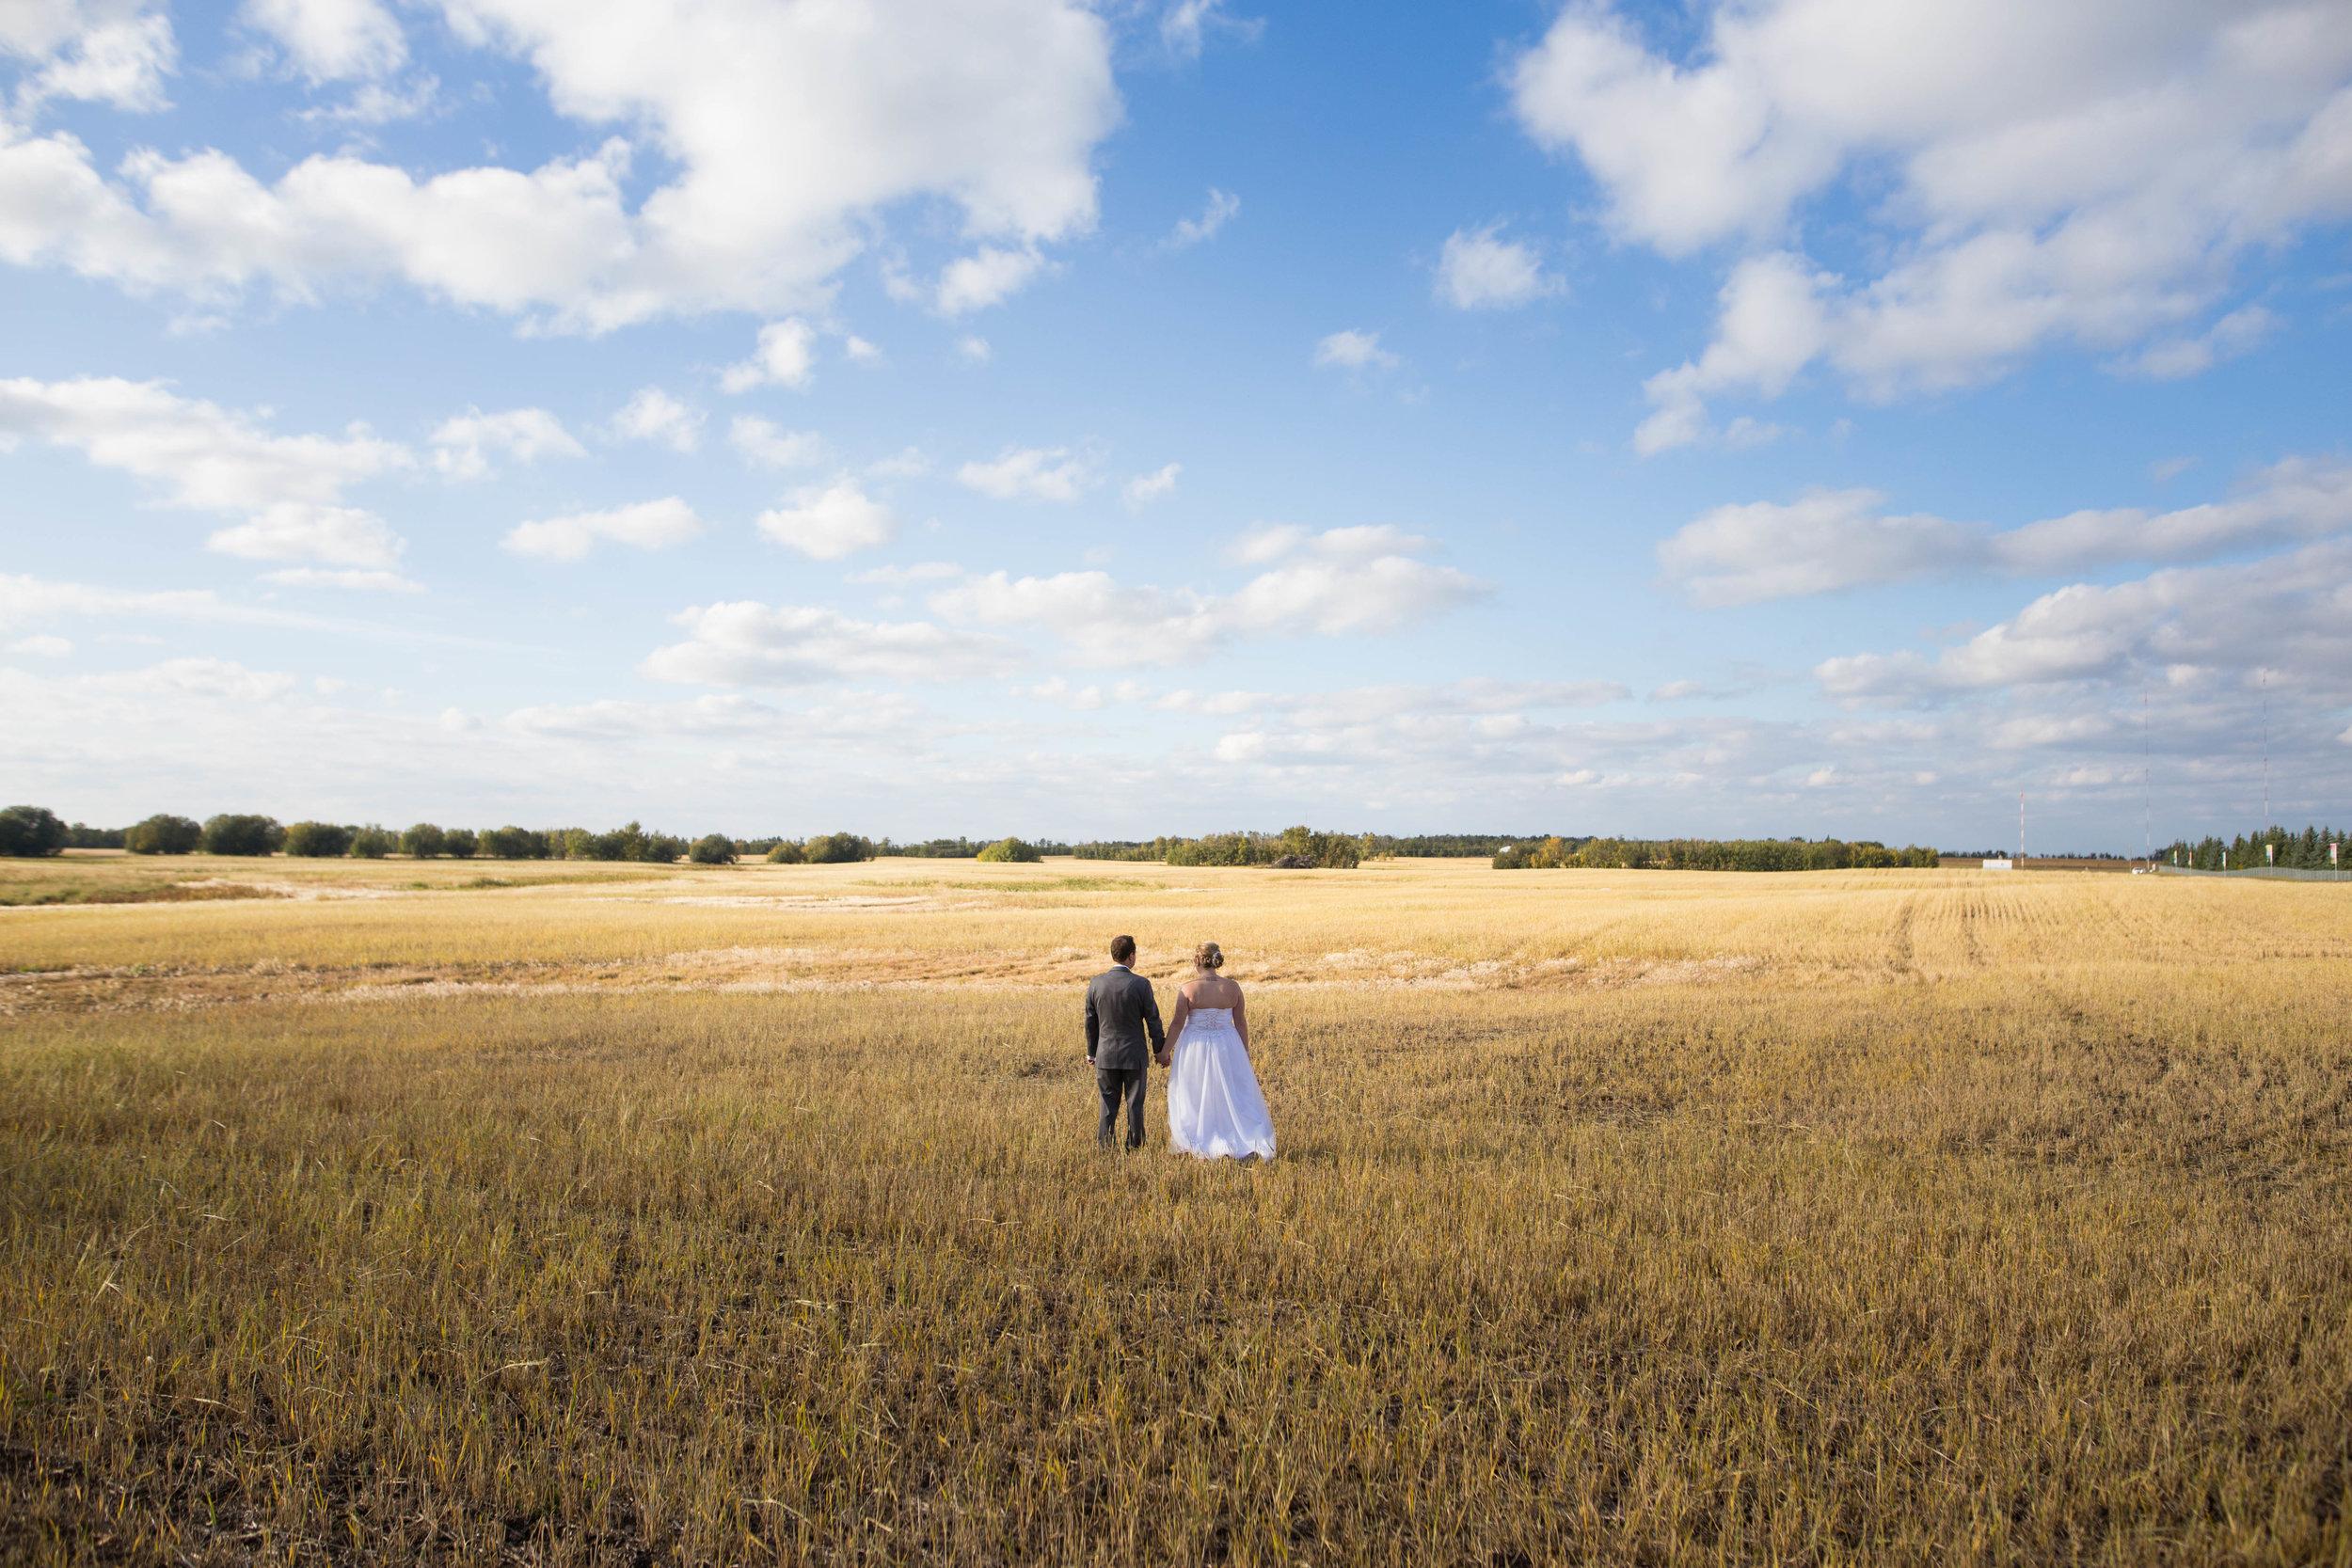 edmonton based wedding photographer